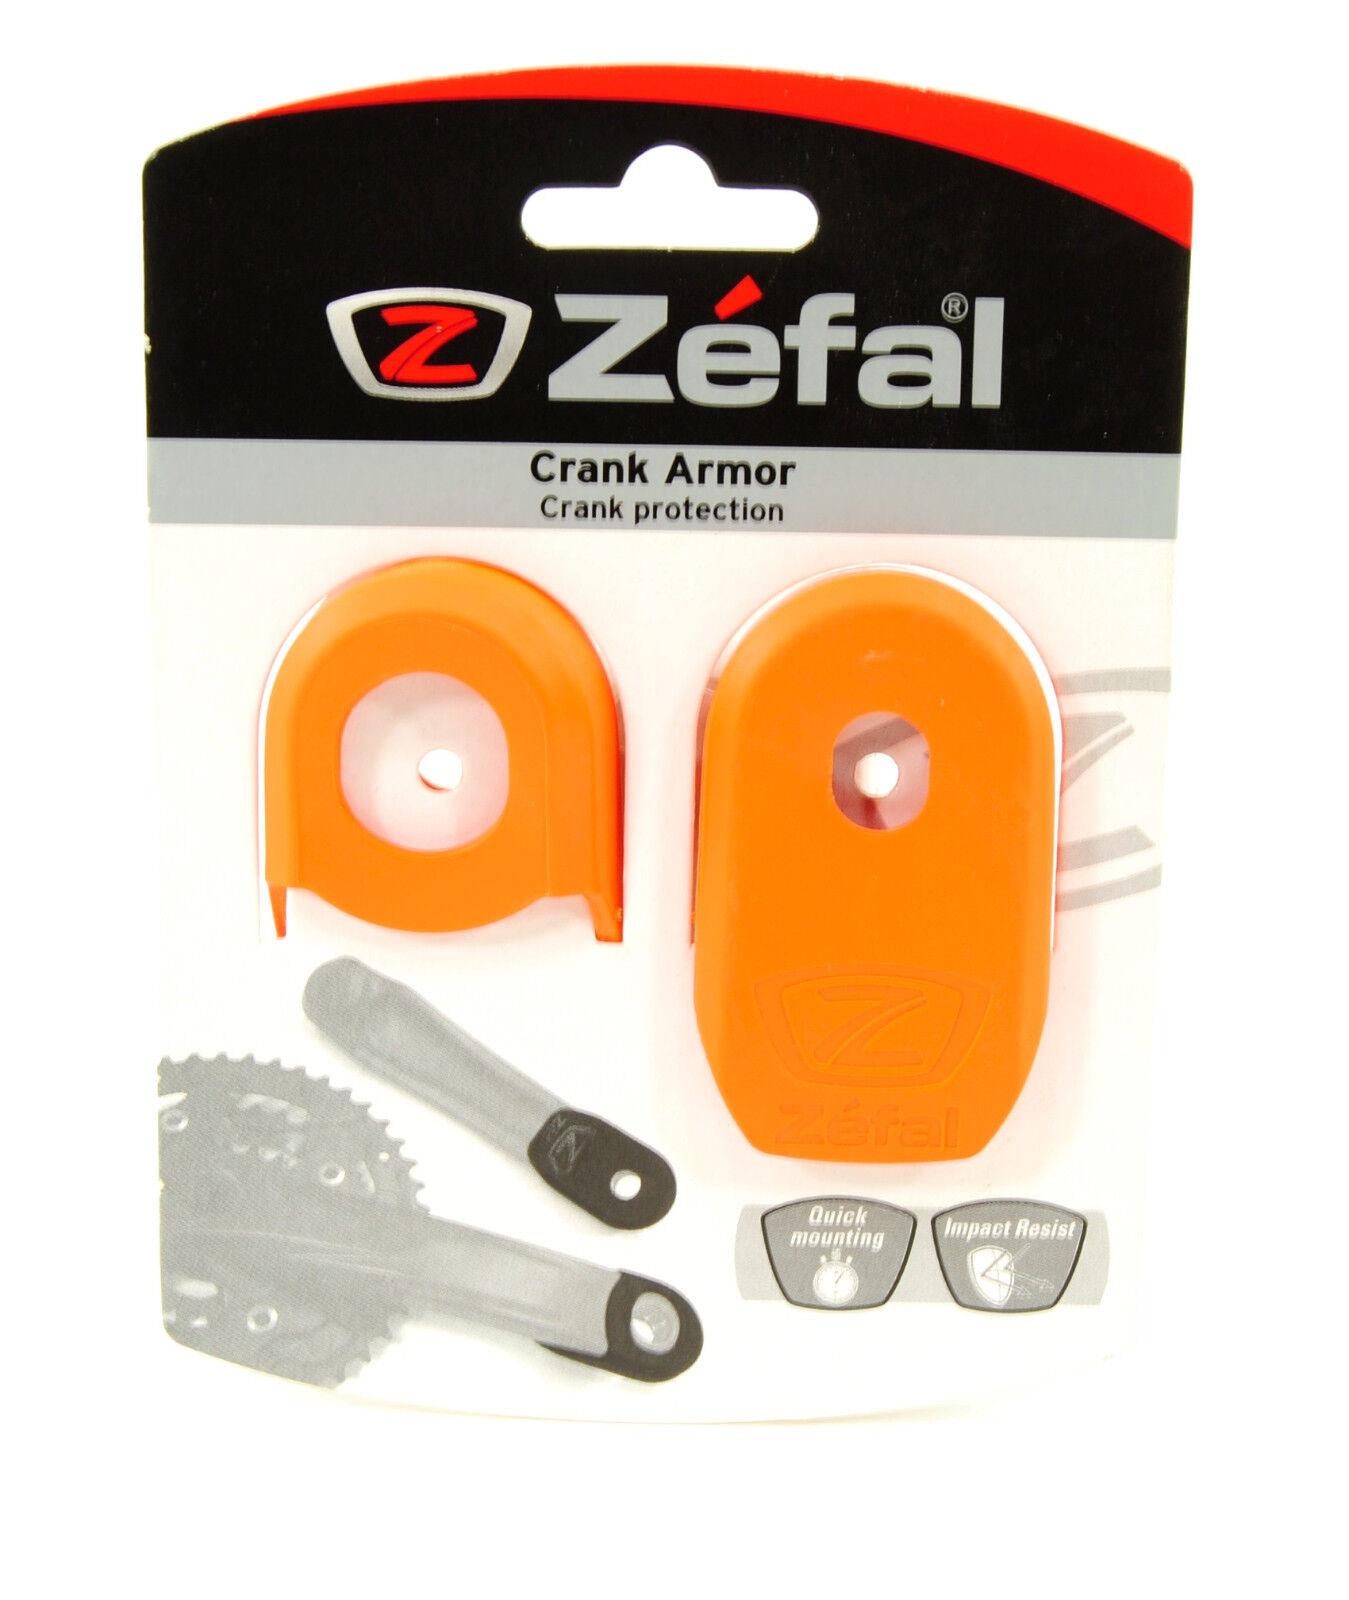 Zefal crank armor yellow protection pair crank mtb pedalier velo vtc tip